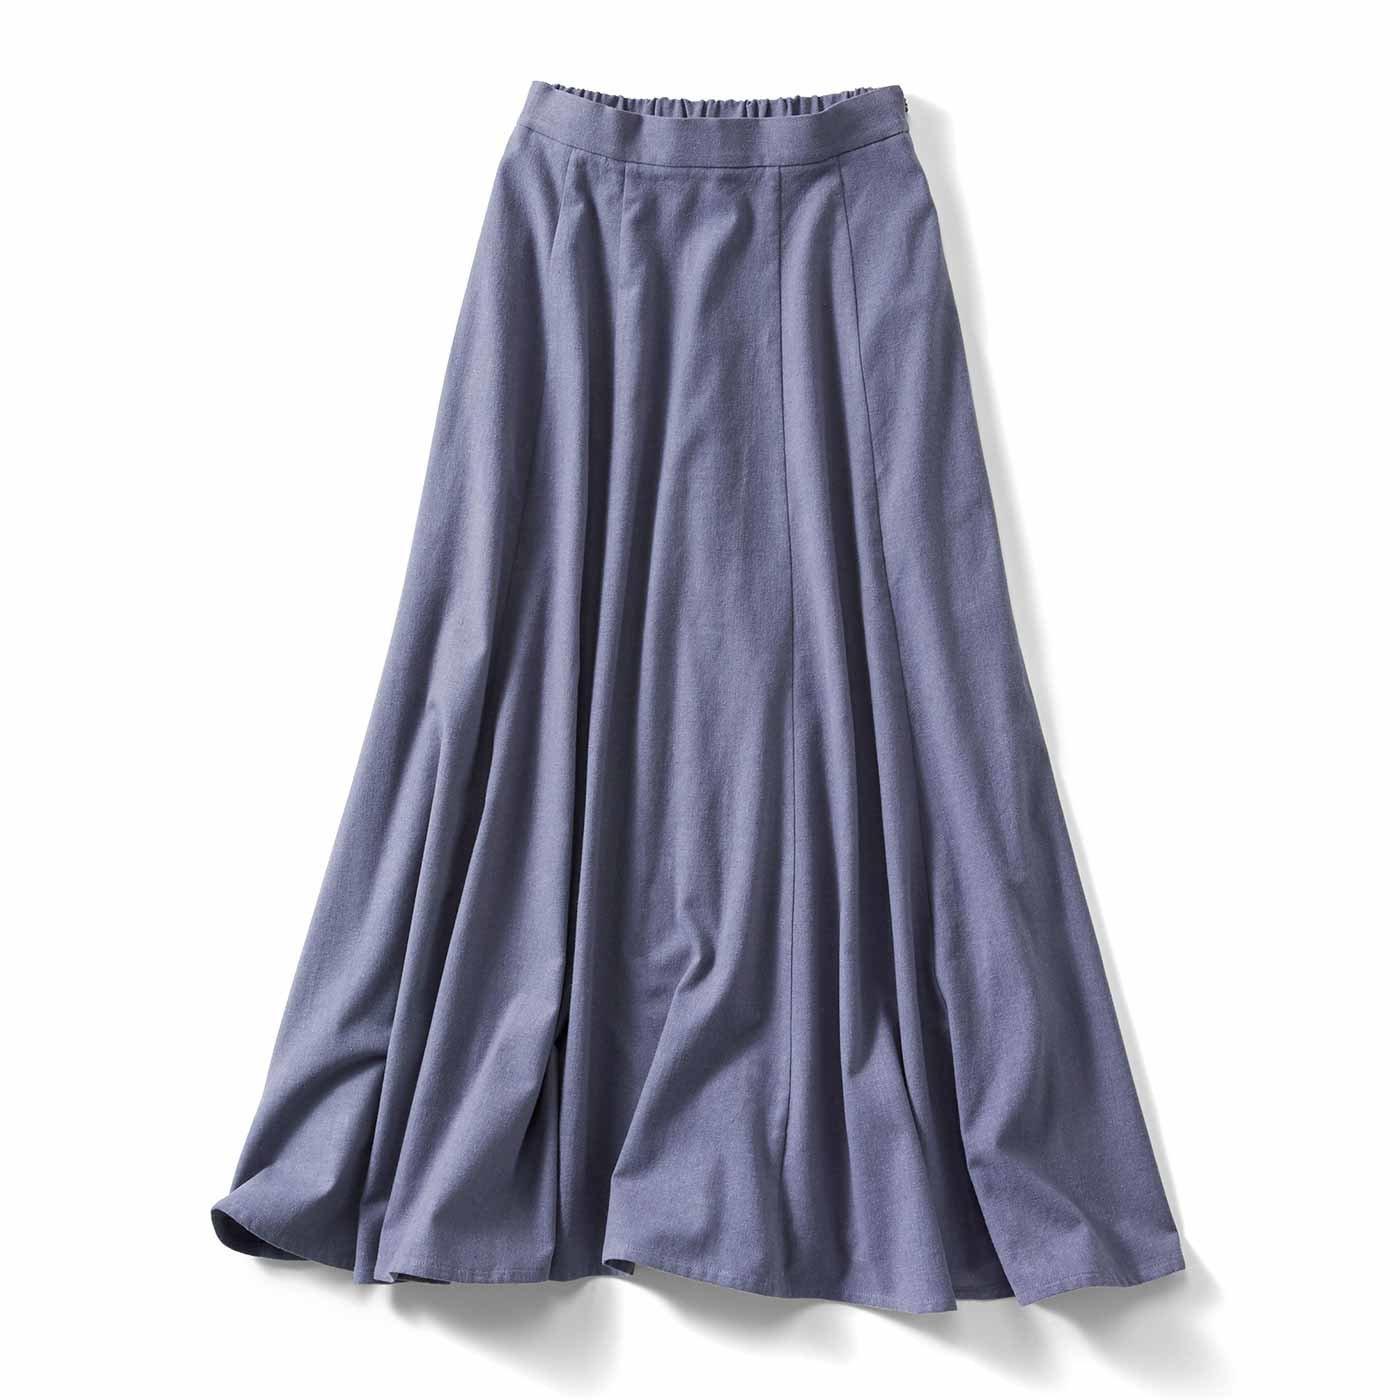 IEDIT[イディット] アンティーク風起毛仕立てのコットンリネンマキシスカート〈ブルー〉